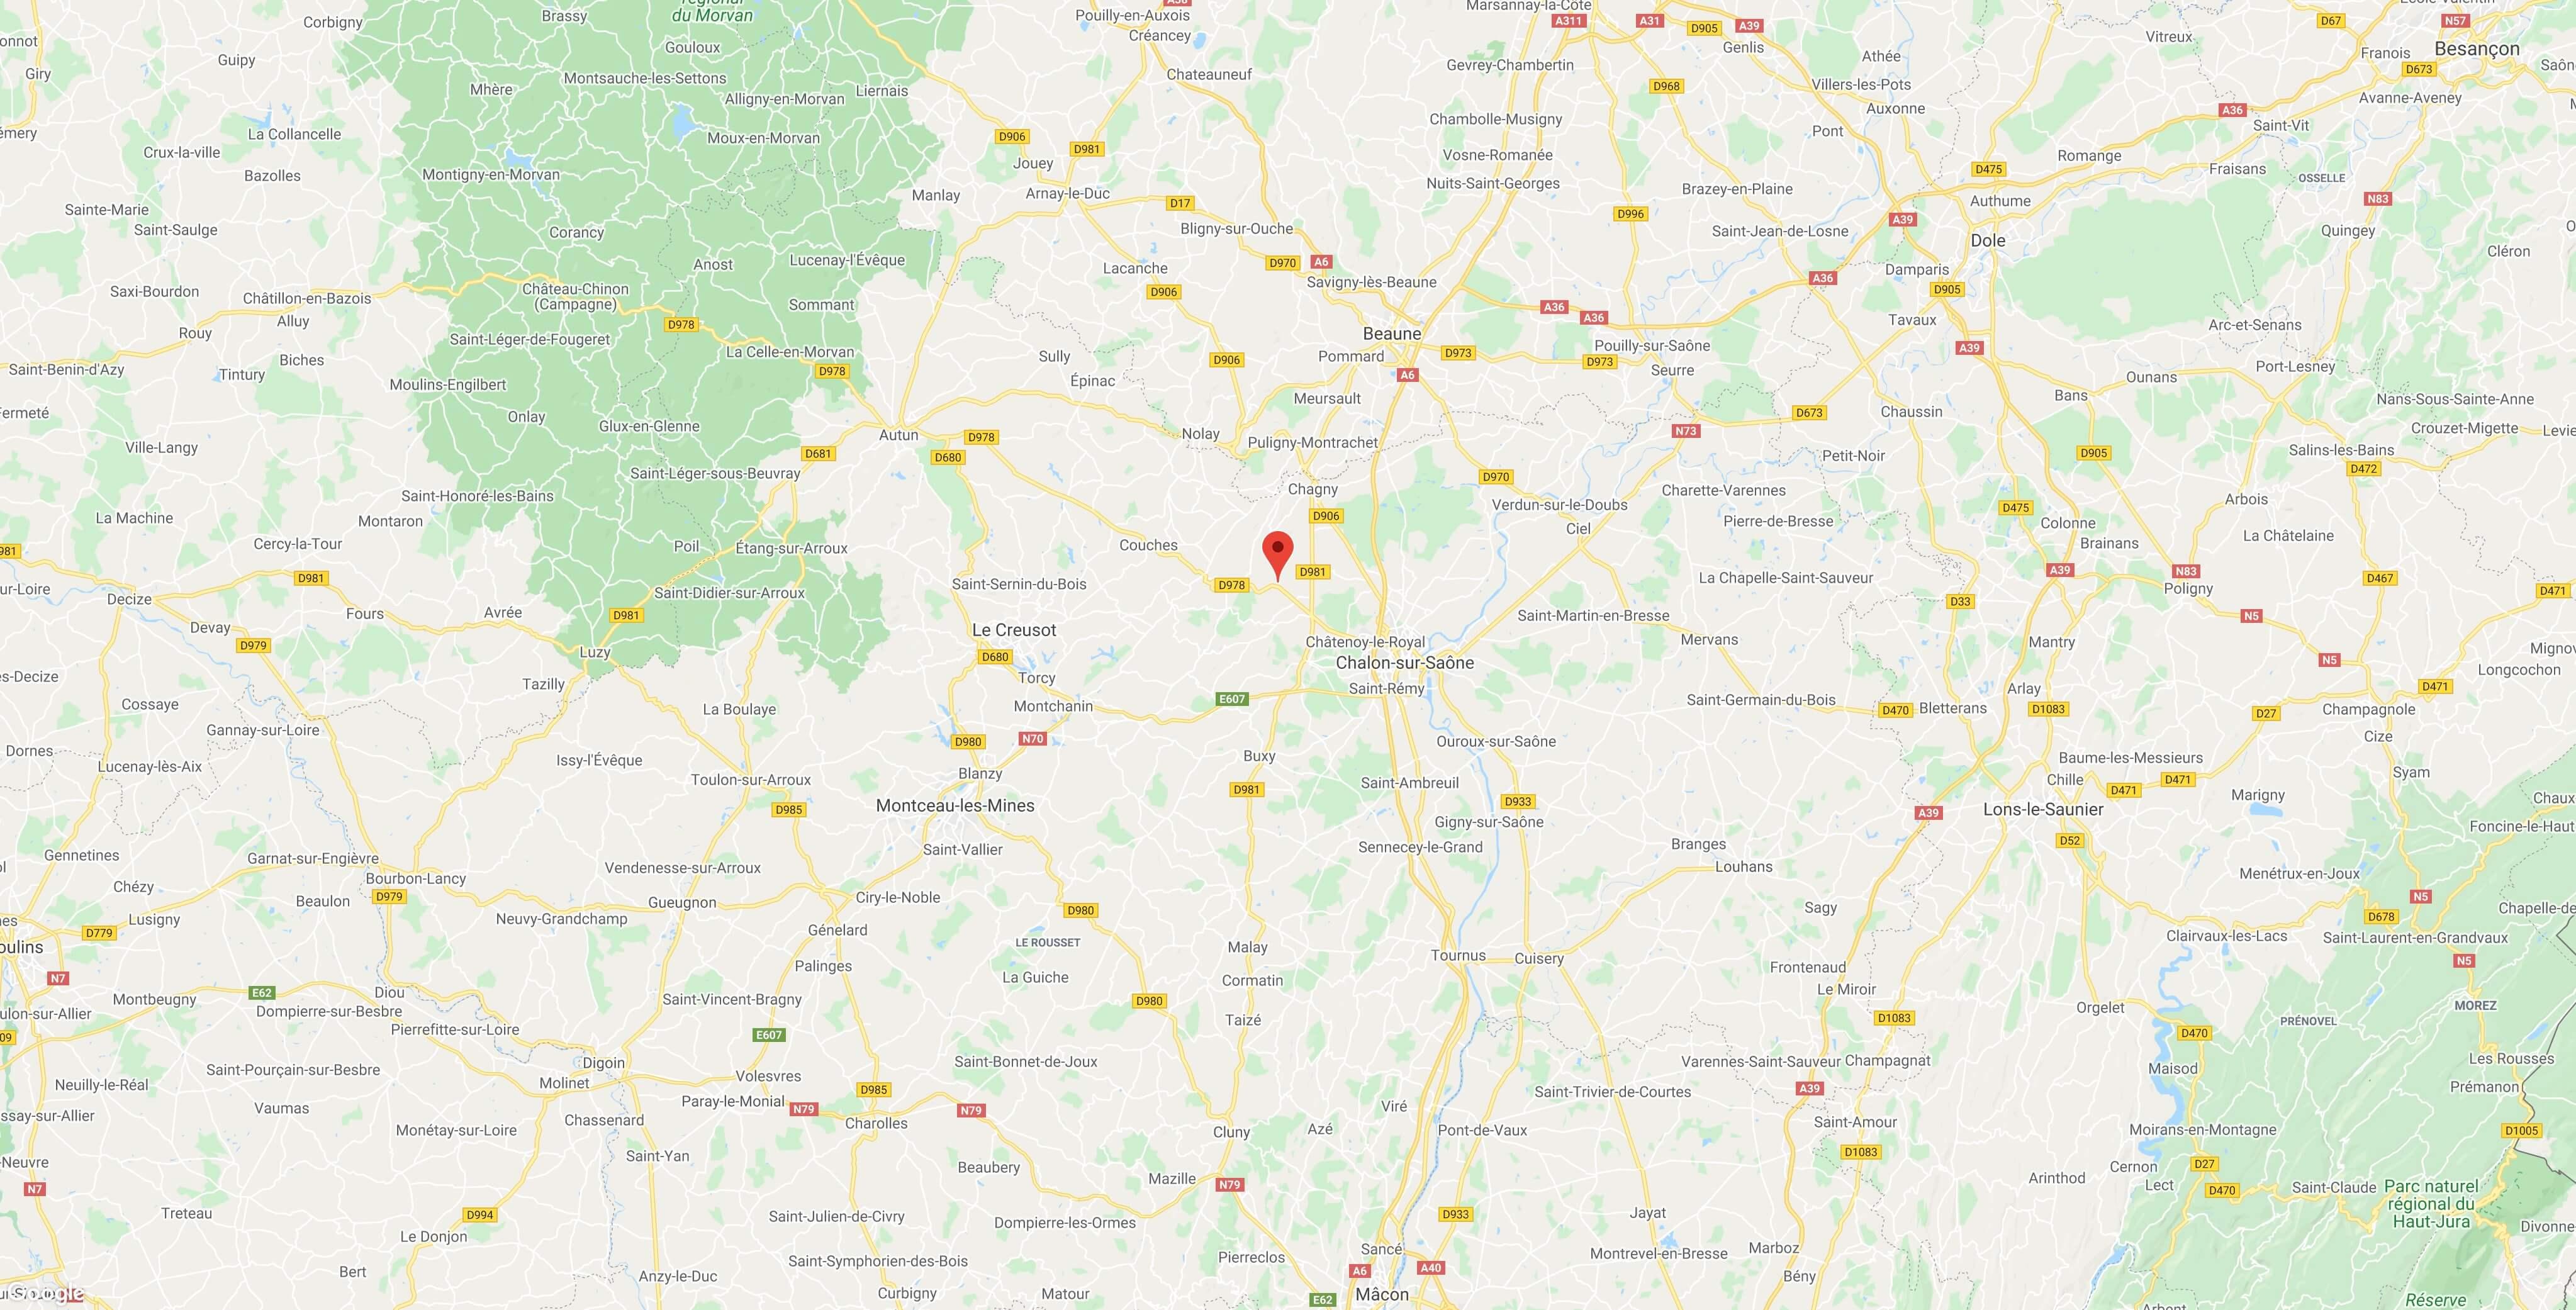 image<span><span><span><span><span>Domaine &amp; Vigneron, Mercurey Bourgogne</span></span></span></span></span>